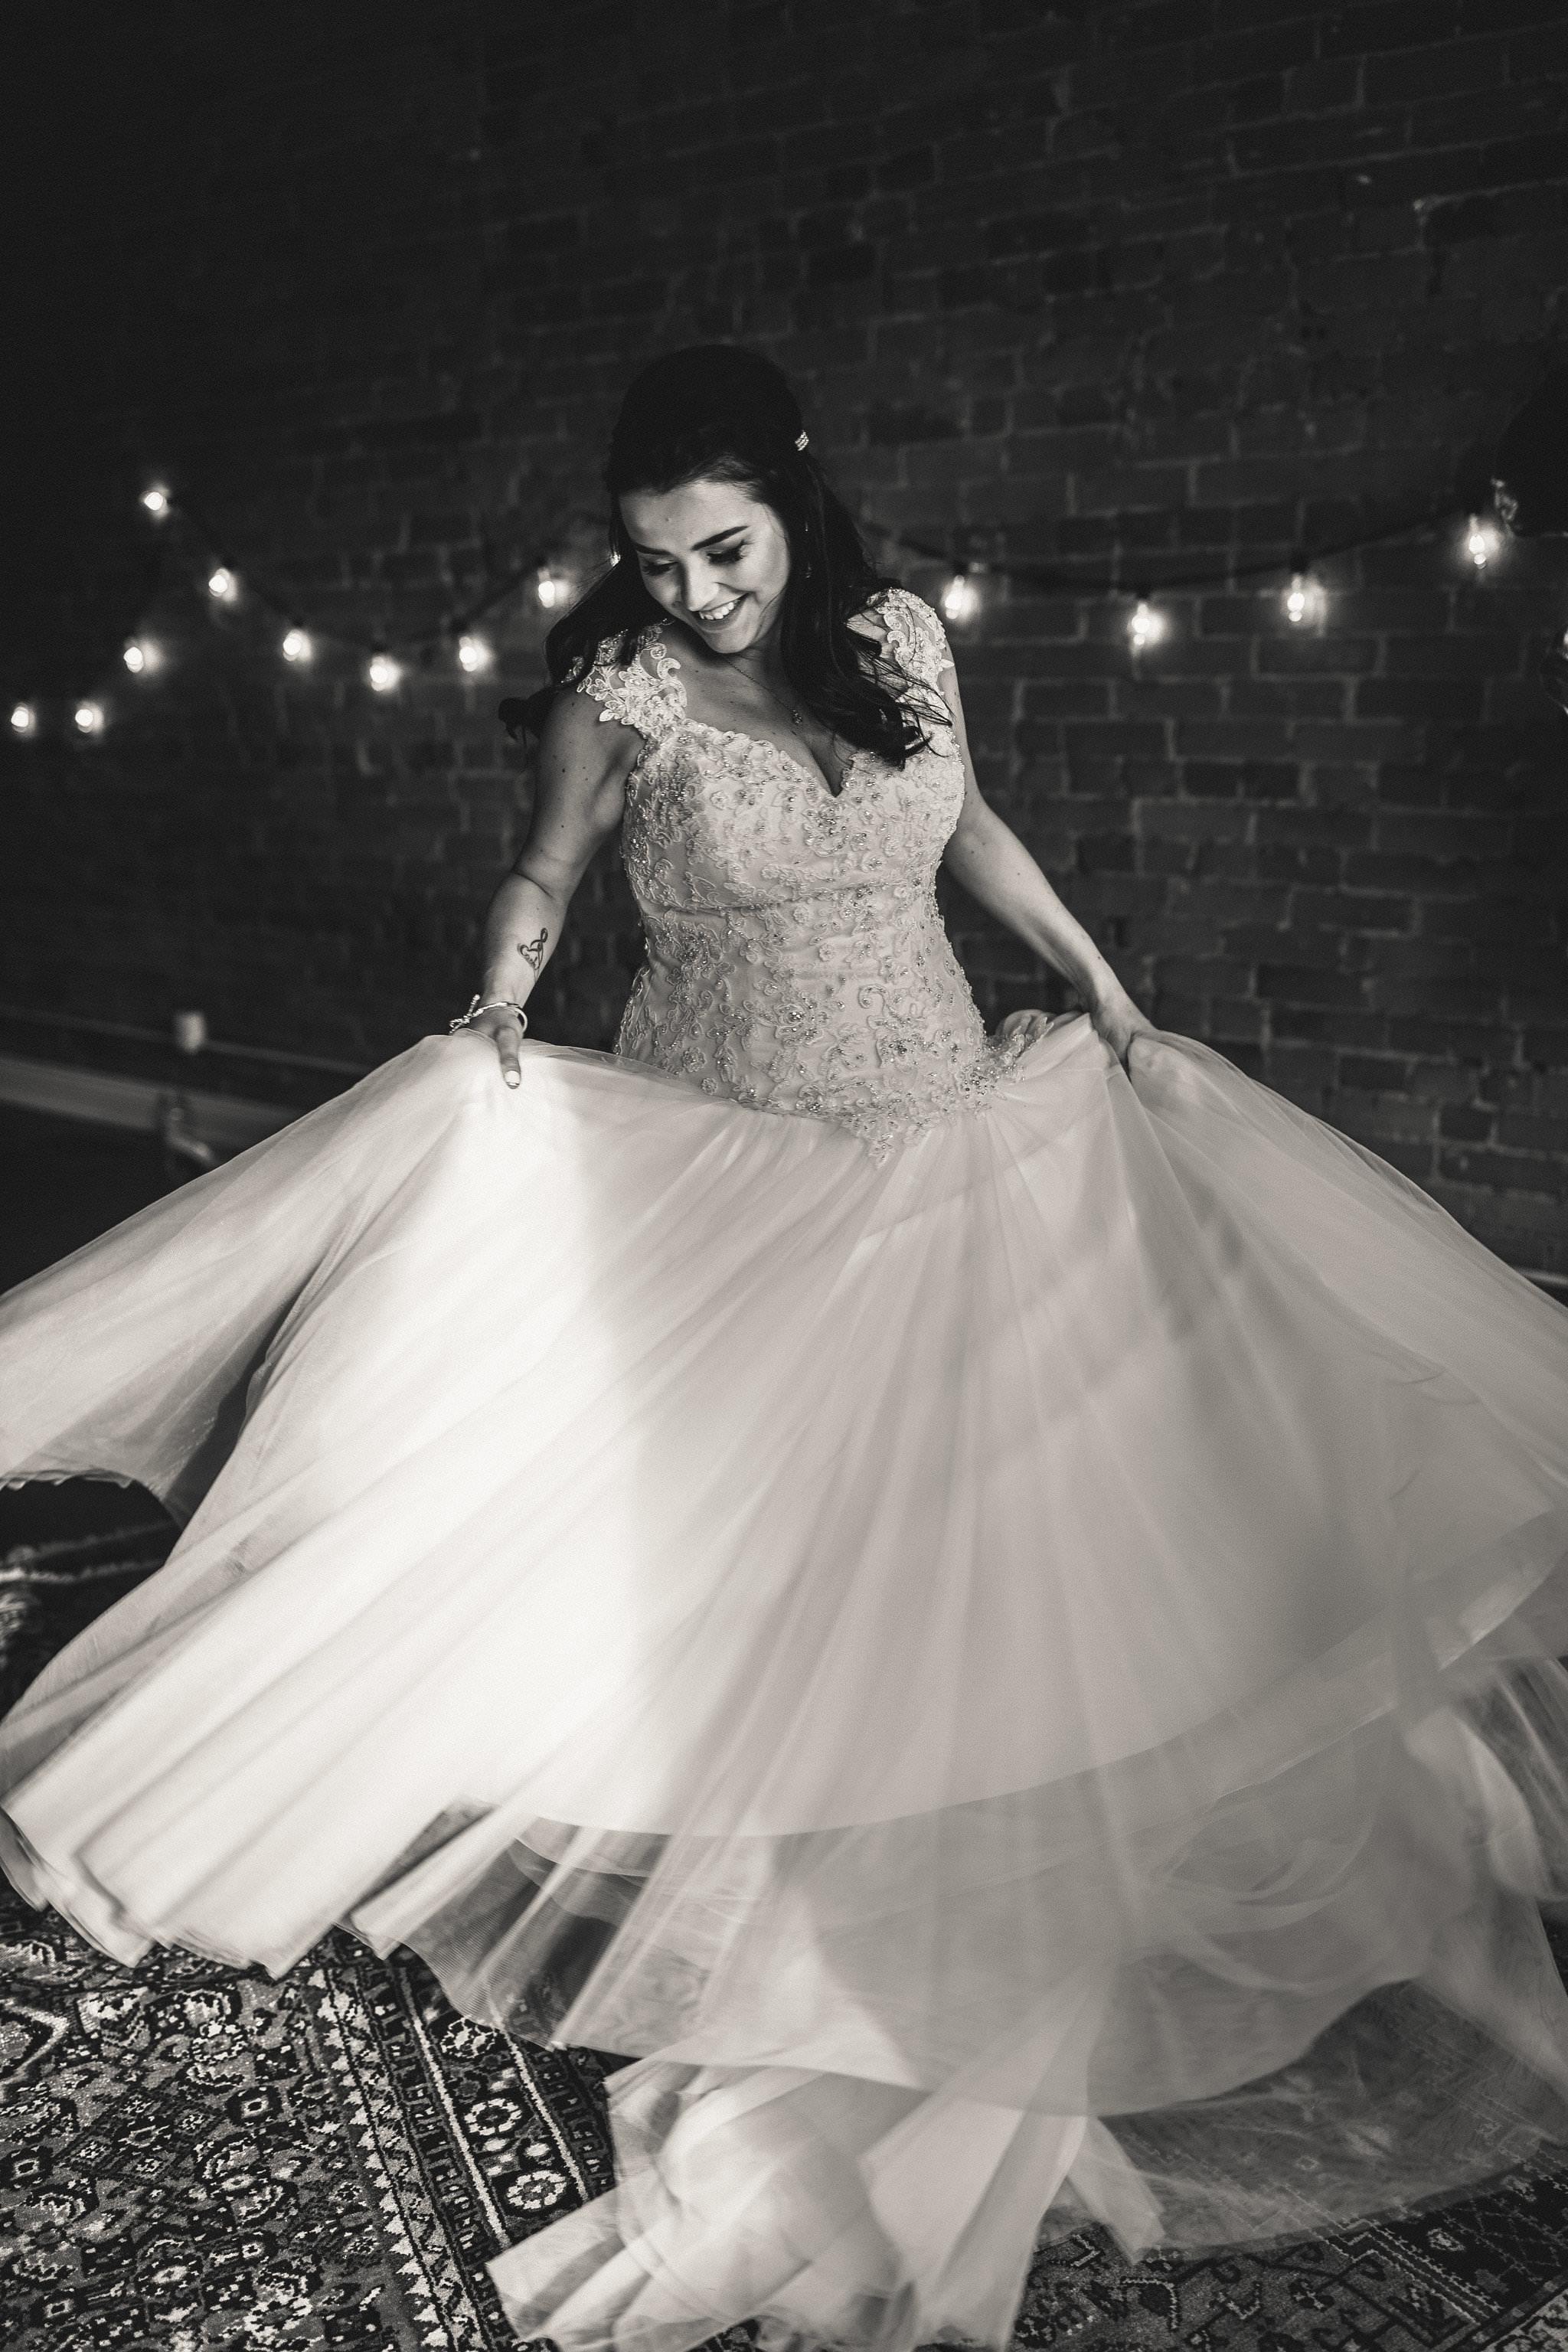 Kristen Adam Kindred Loft Whitby Wedding Photos 351 - Durham Wedding Photographer: Kindred Loft Wedding Photos